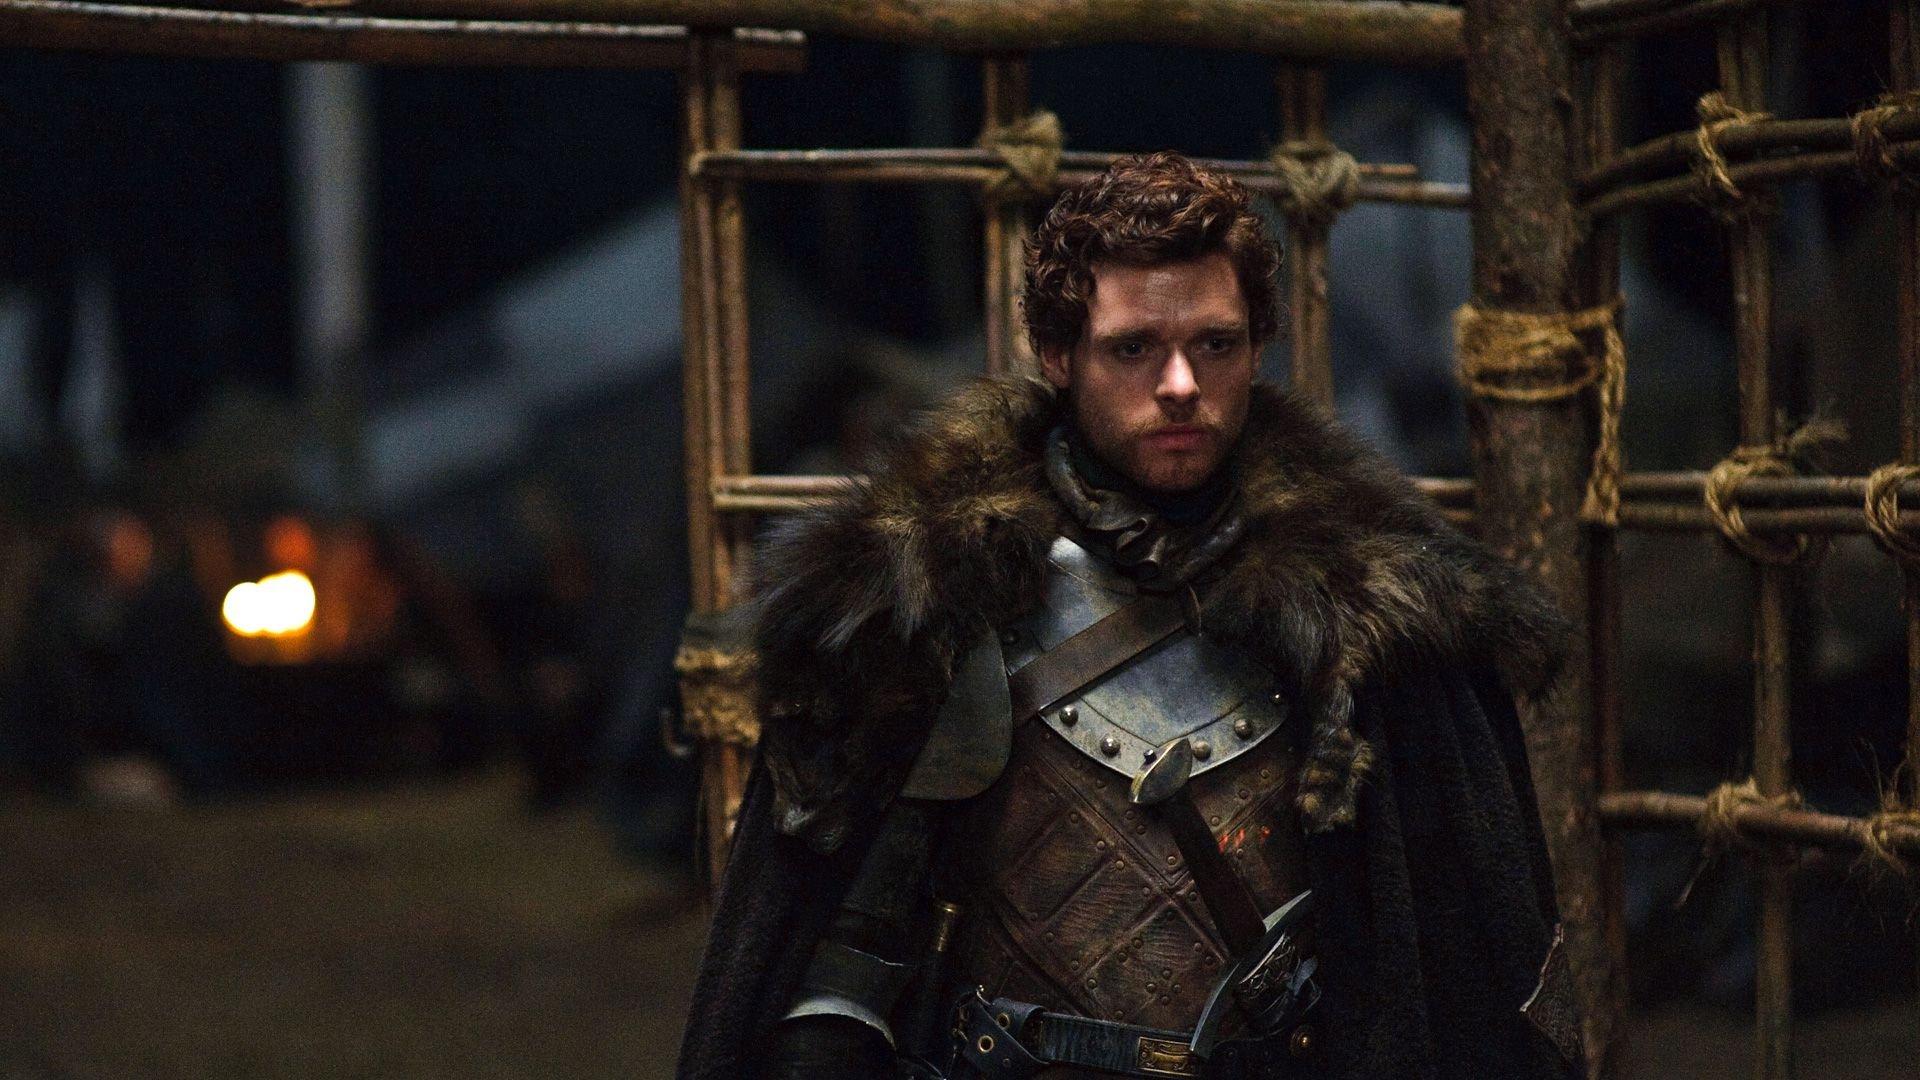 Game of Thrones Recap: Season 2, Episode 1, The North Remembers